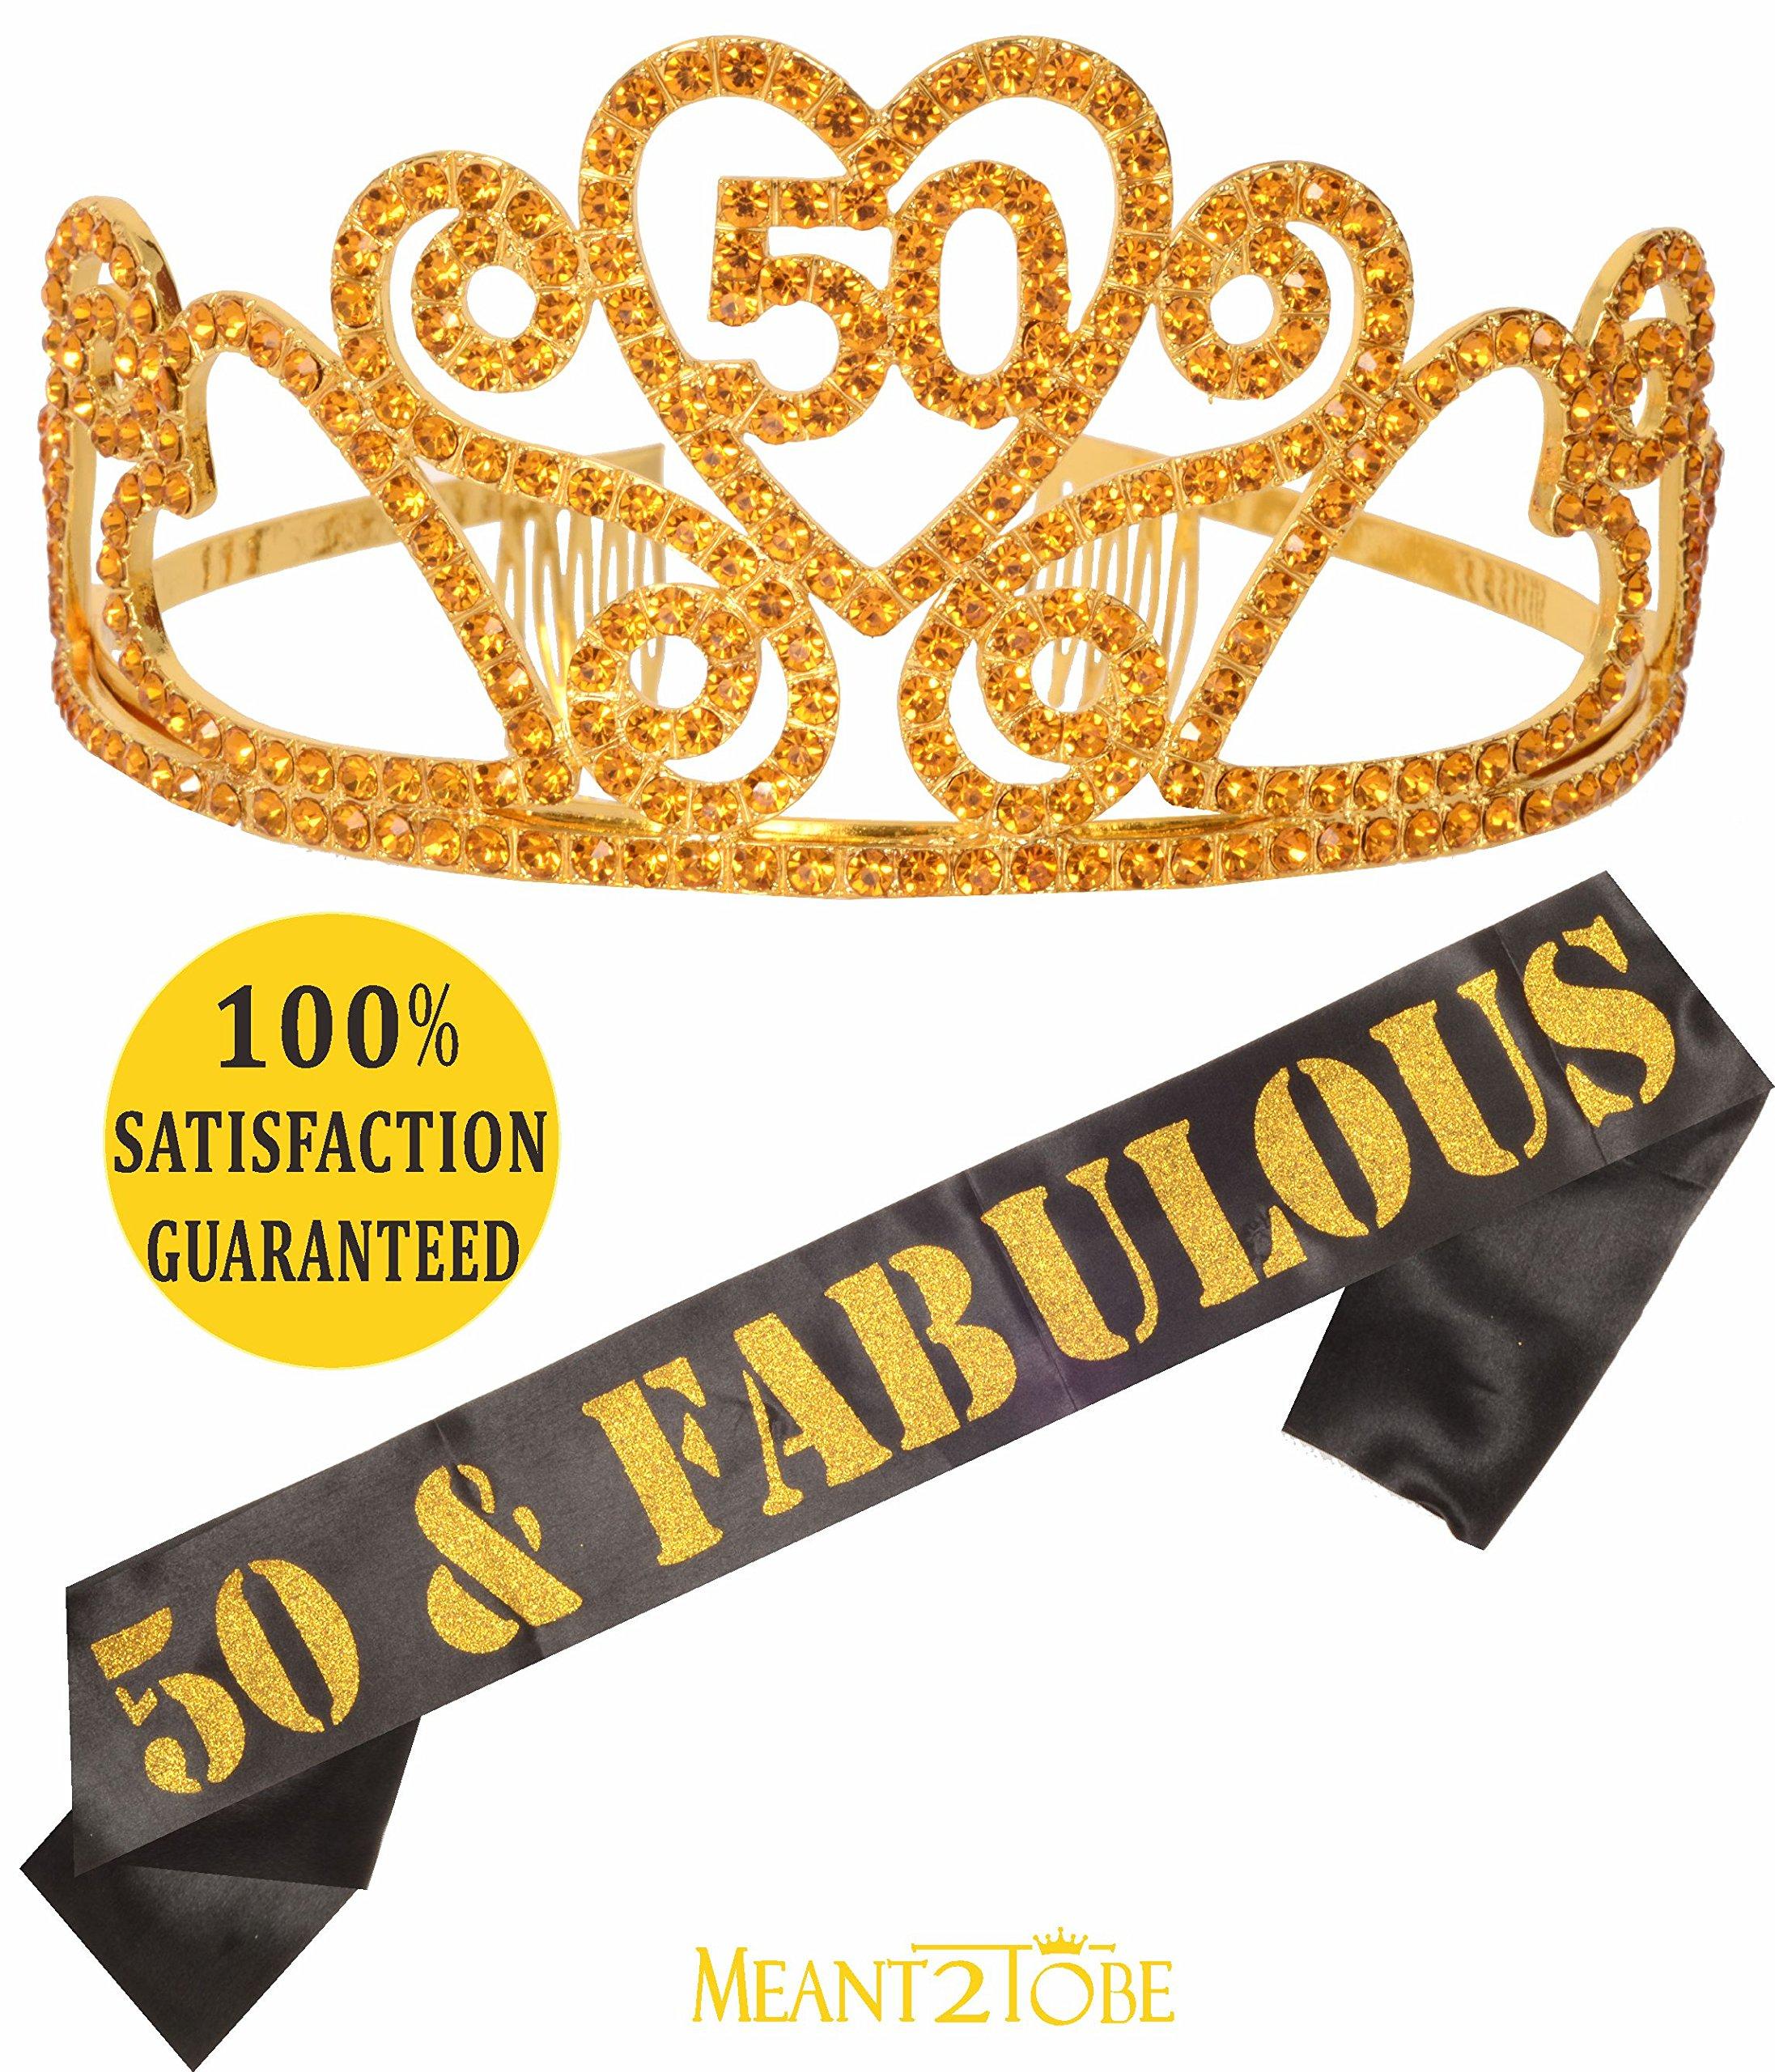 Gold 50th Birthday Tiara and Sash, HAPPY 50th Birthday Party Supplies, 50 & Fabulous Black Glitter Satin Sash and Crystal Tiara Birthday Crown for 50th Birthday Party Supplies and Decoration